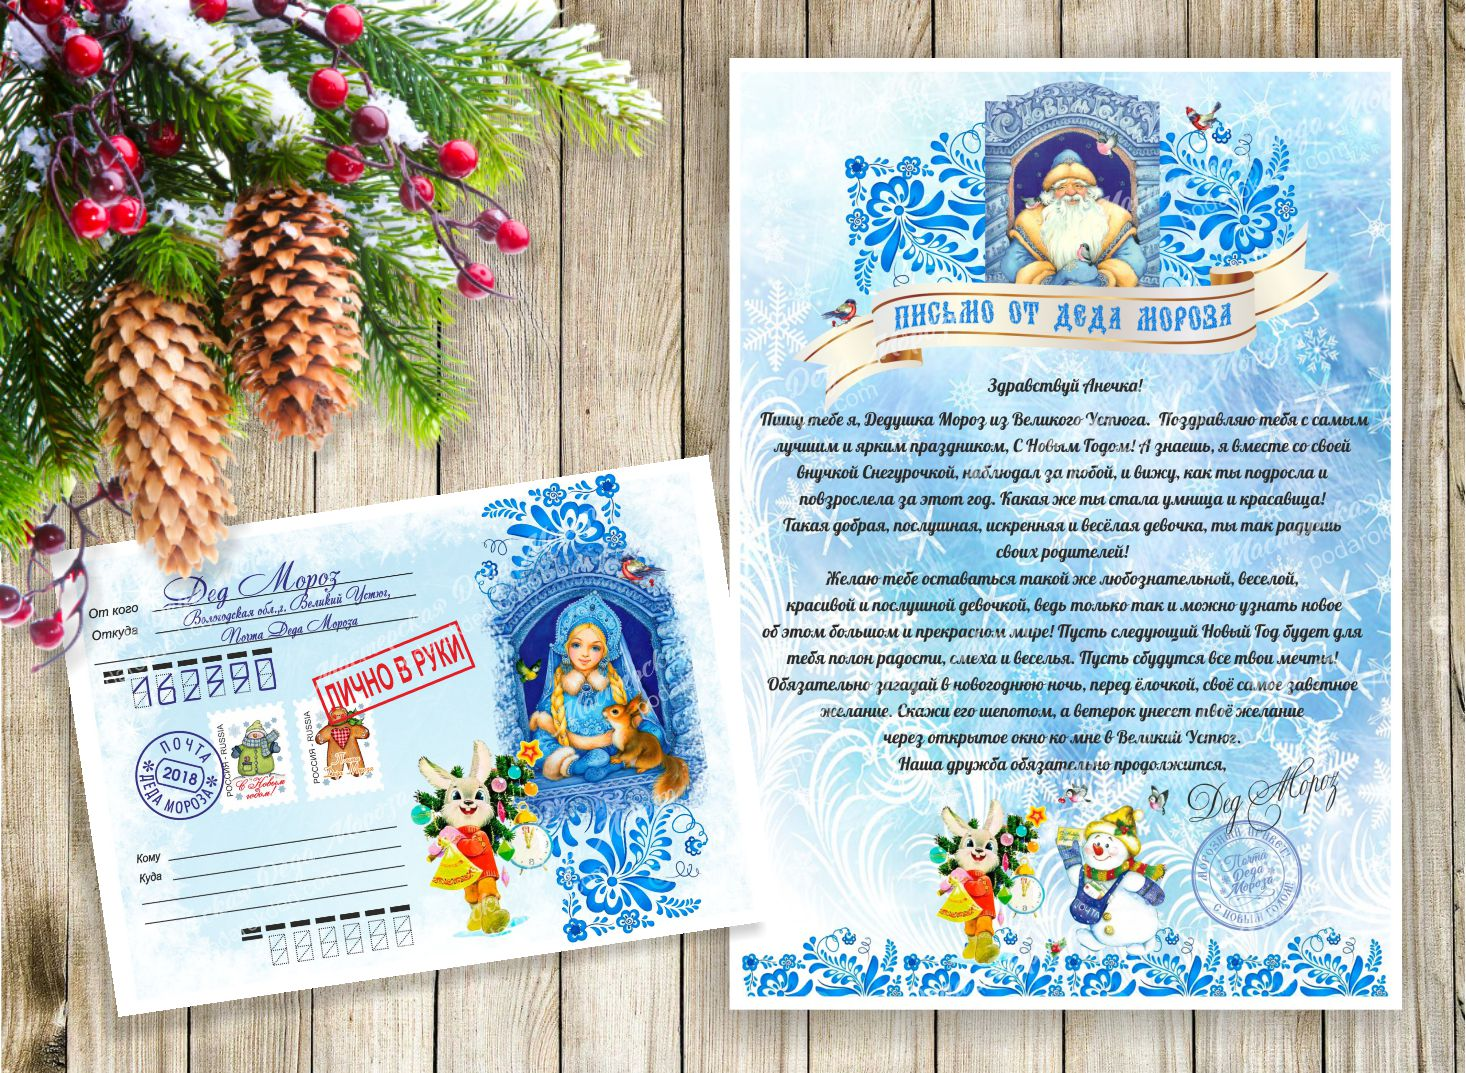 конверт от деда мороза с поздравлениями сайте групона